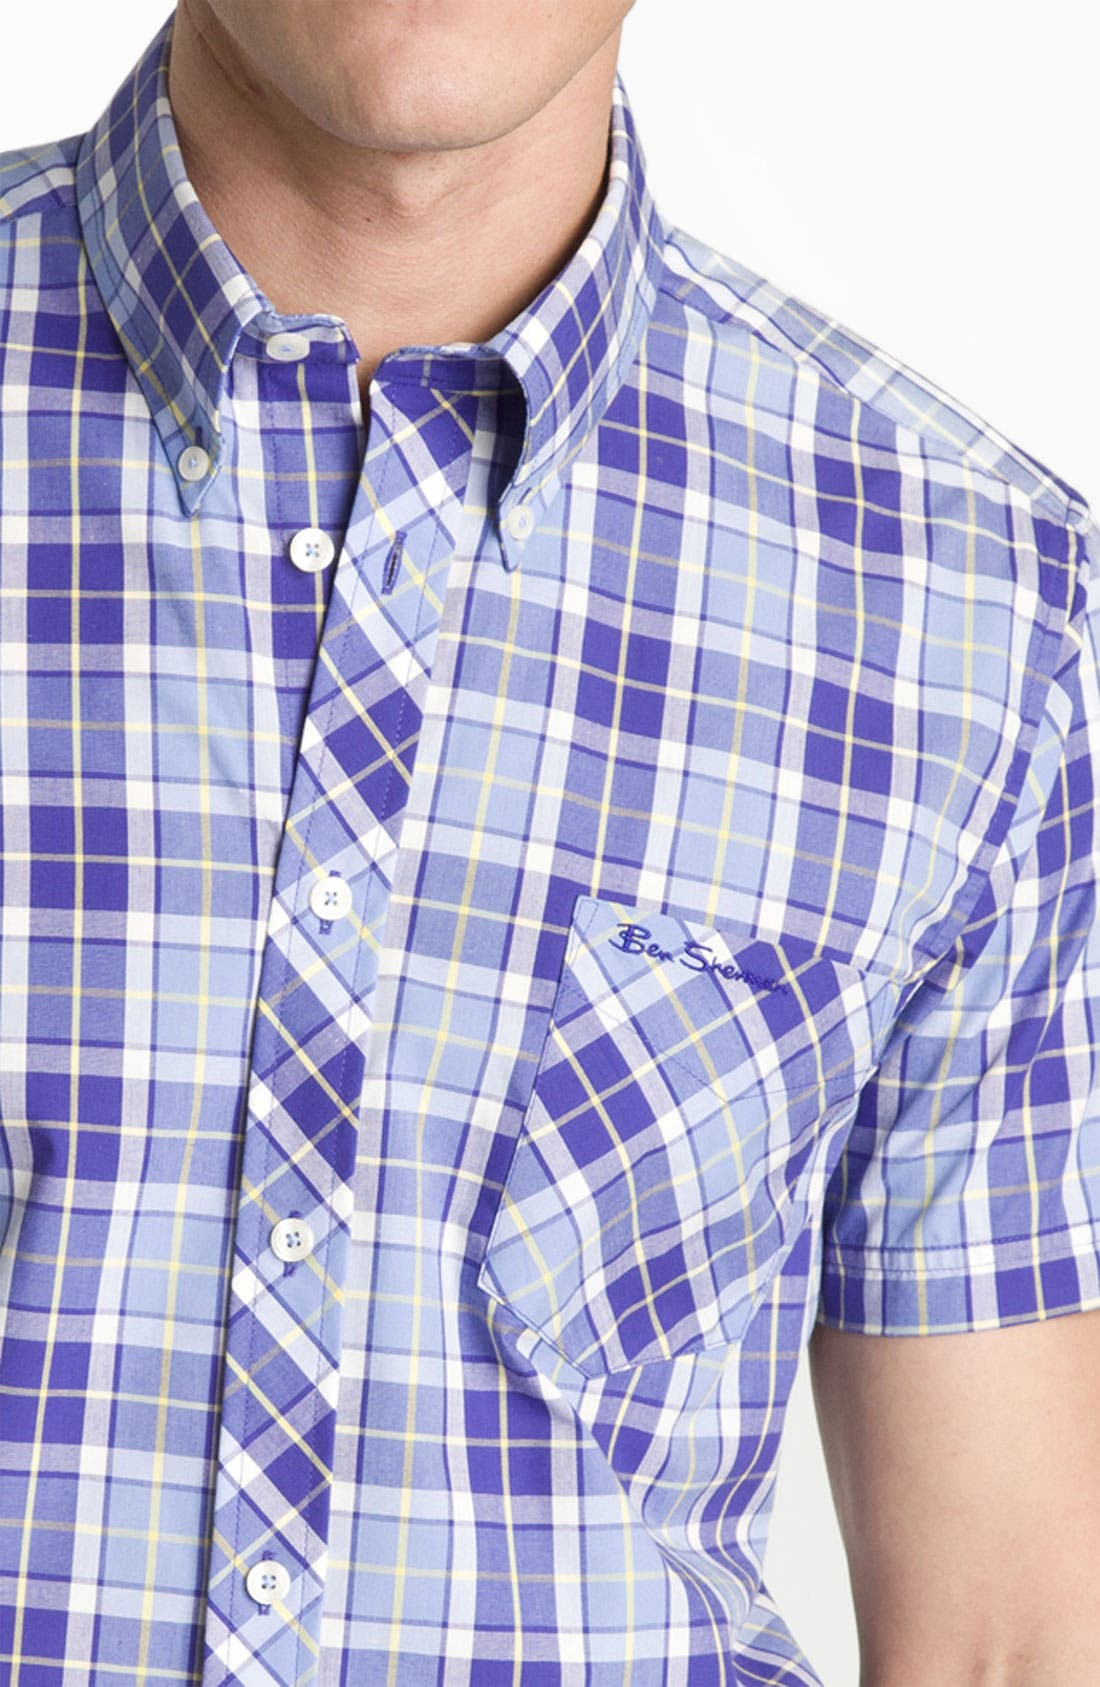 Alternate Image 3  - Ben Sherman 'Covent' Plaid Woven Shirt